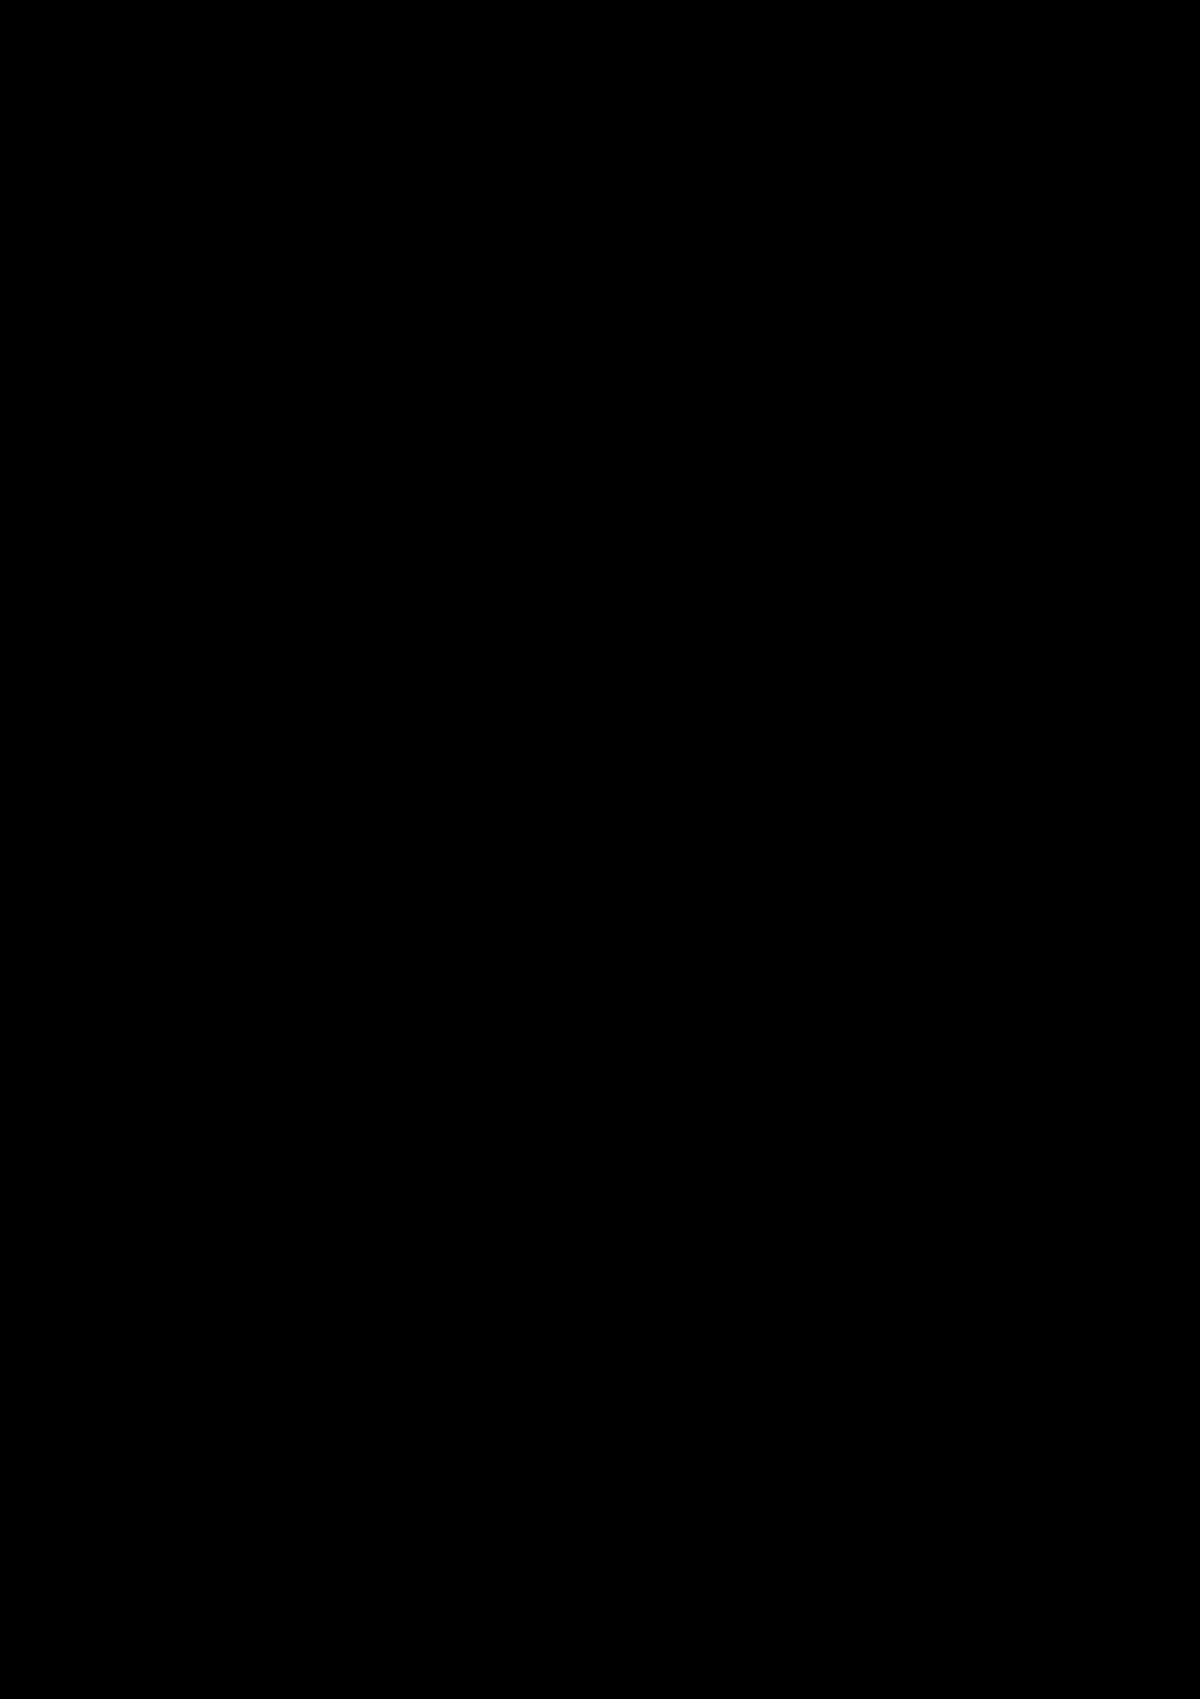 tofizopam-formula-iz-viki